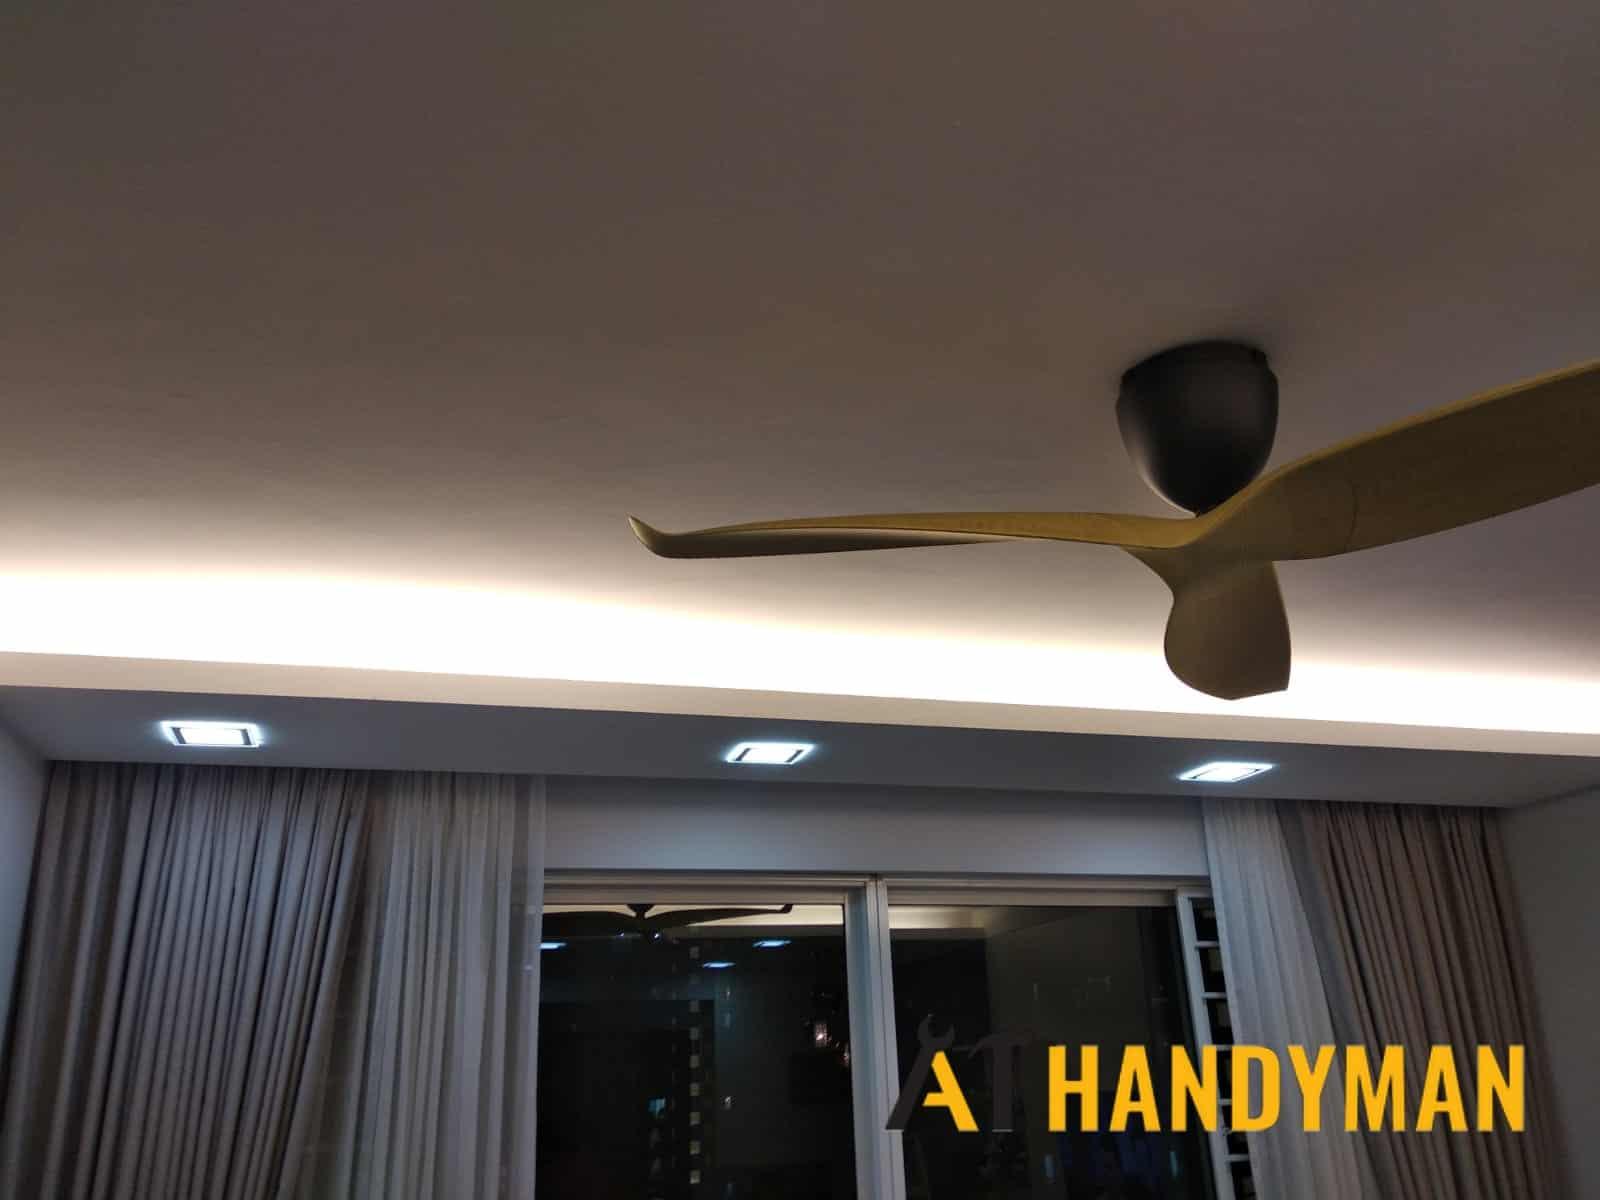 light-installation-electrician-singapore-a1-handyman-singapore-condo-pasir-ris-1_wm